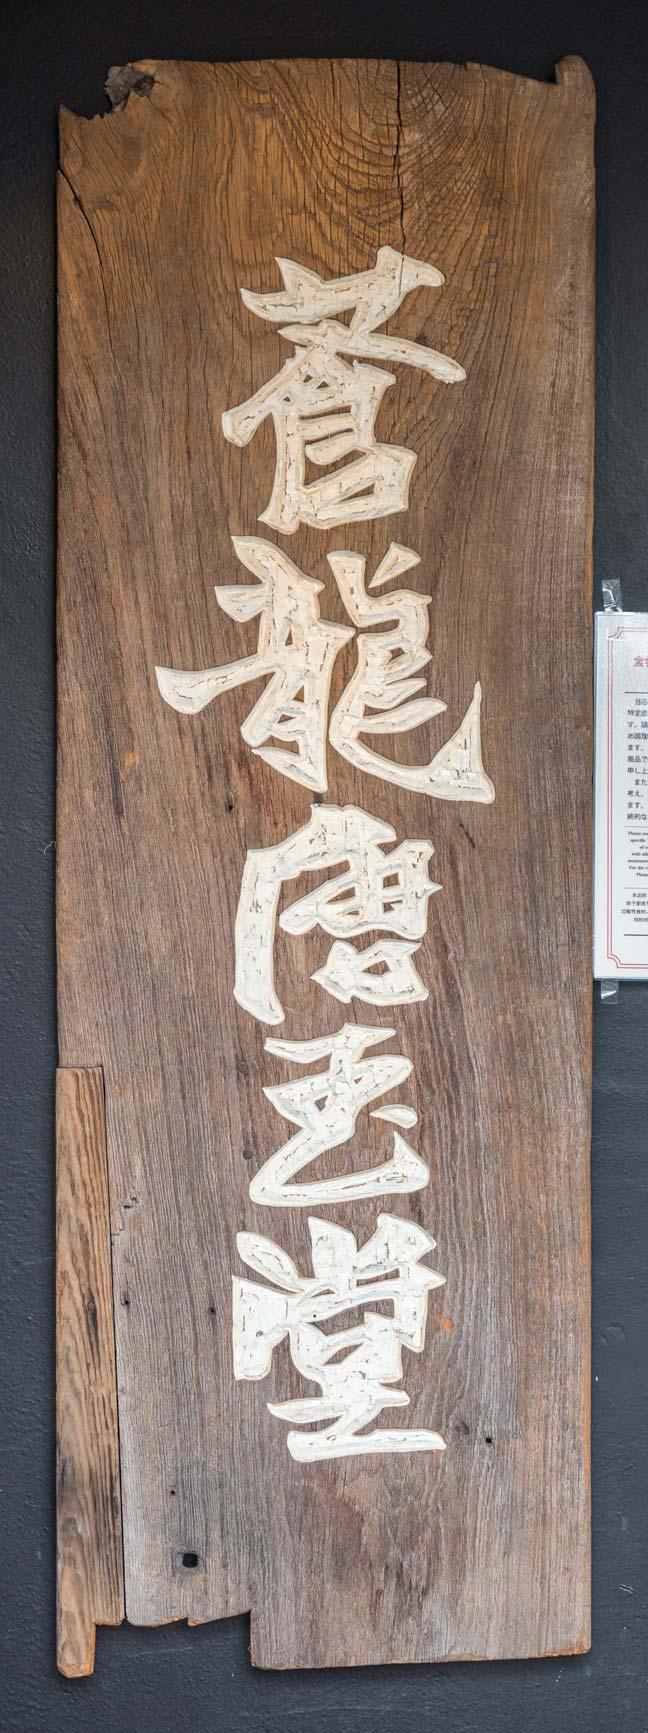 2017-09-03-jp-tokyo-roppongi-signboard-02.jpg